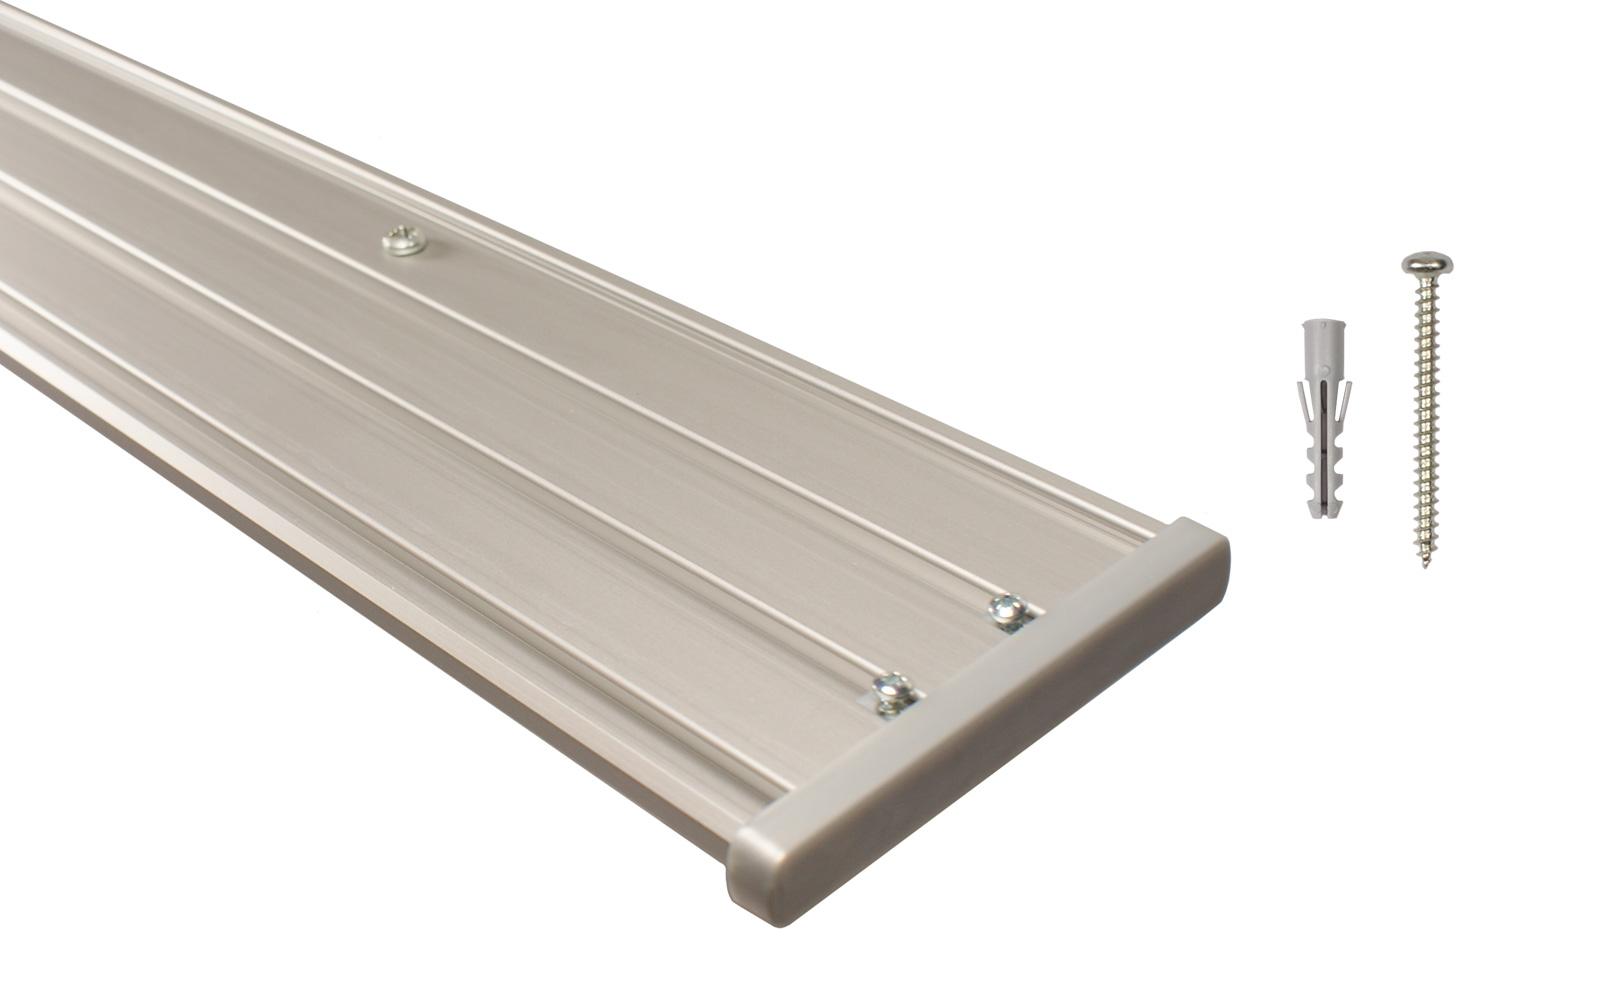 4 l ufige gardinenschiene aus aluminium alu silber vorgebohrt. Black Bedroom Furniture Sets. Home Design Ideas